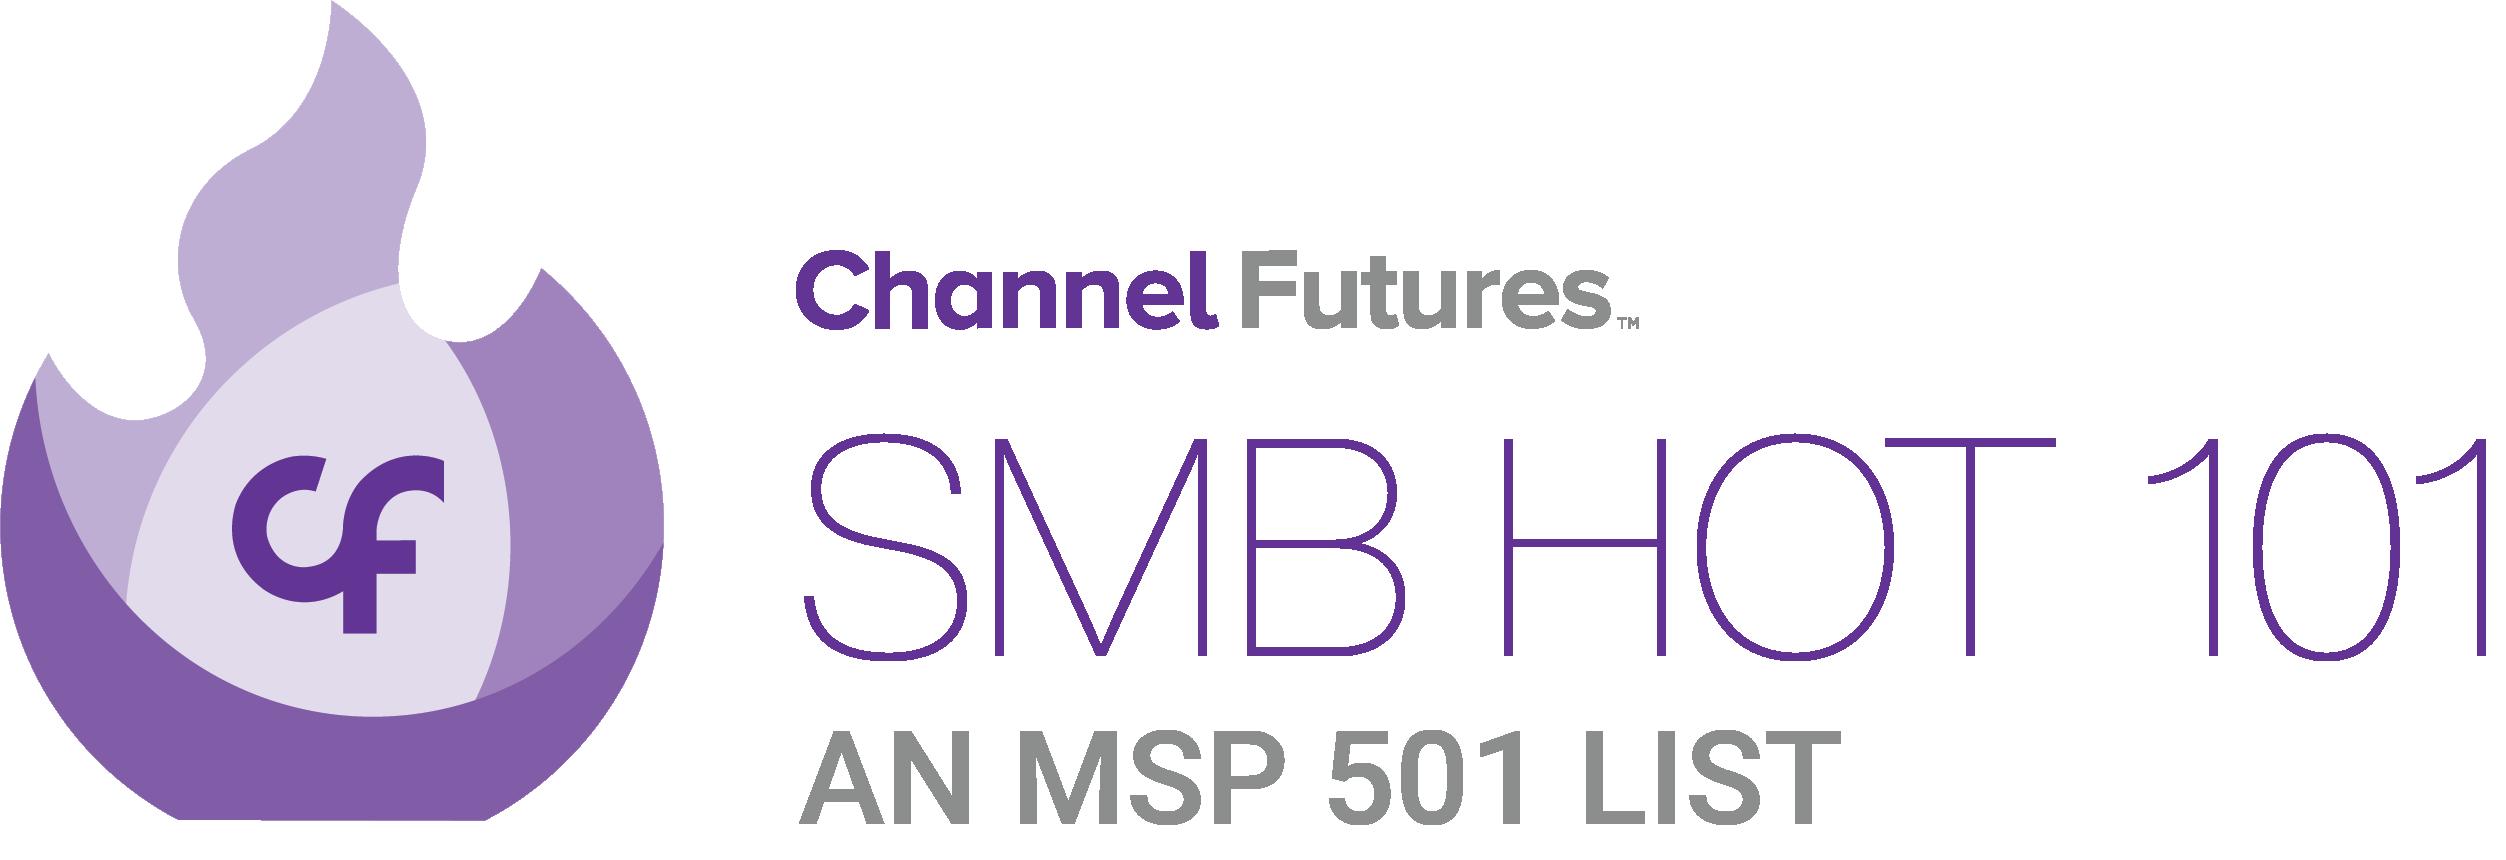 SMB Hot 101